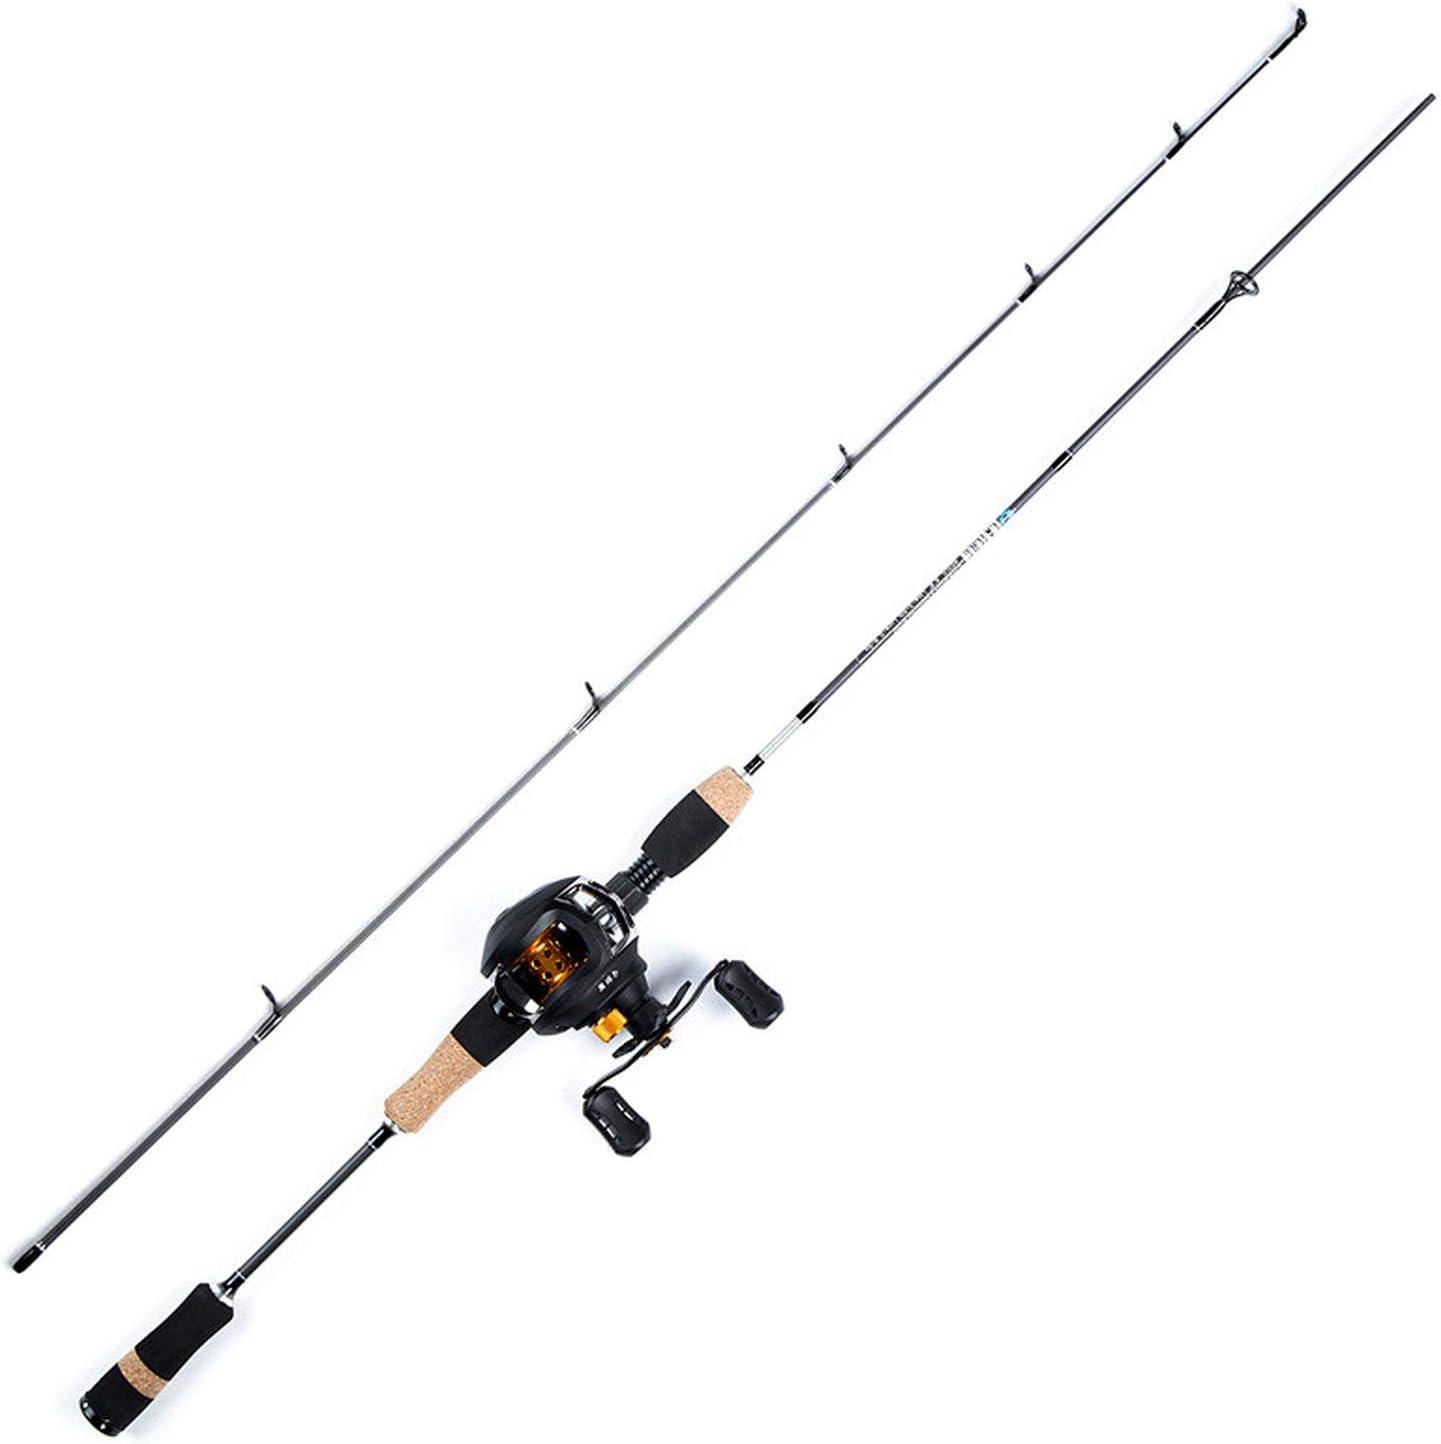 light Saber DUN 1.8M Fishing Rod Carbon Spinning Rods UL